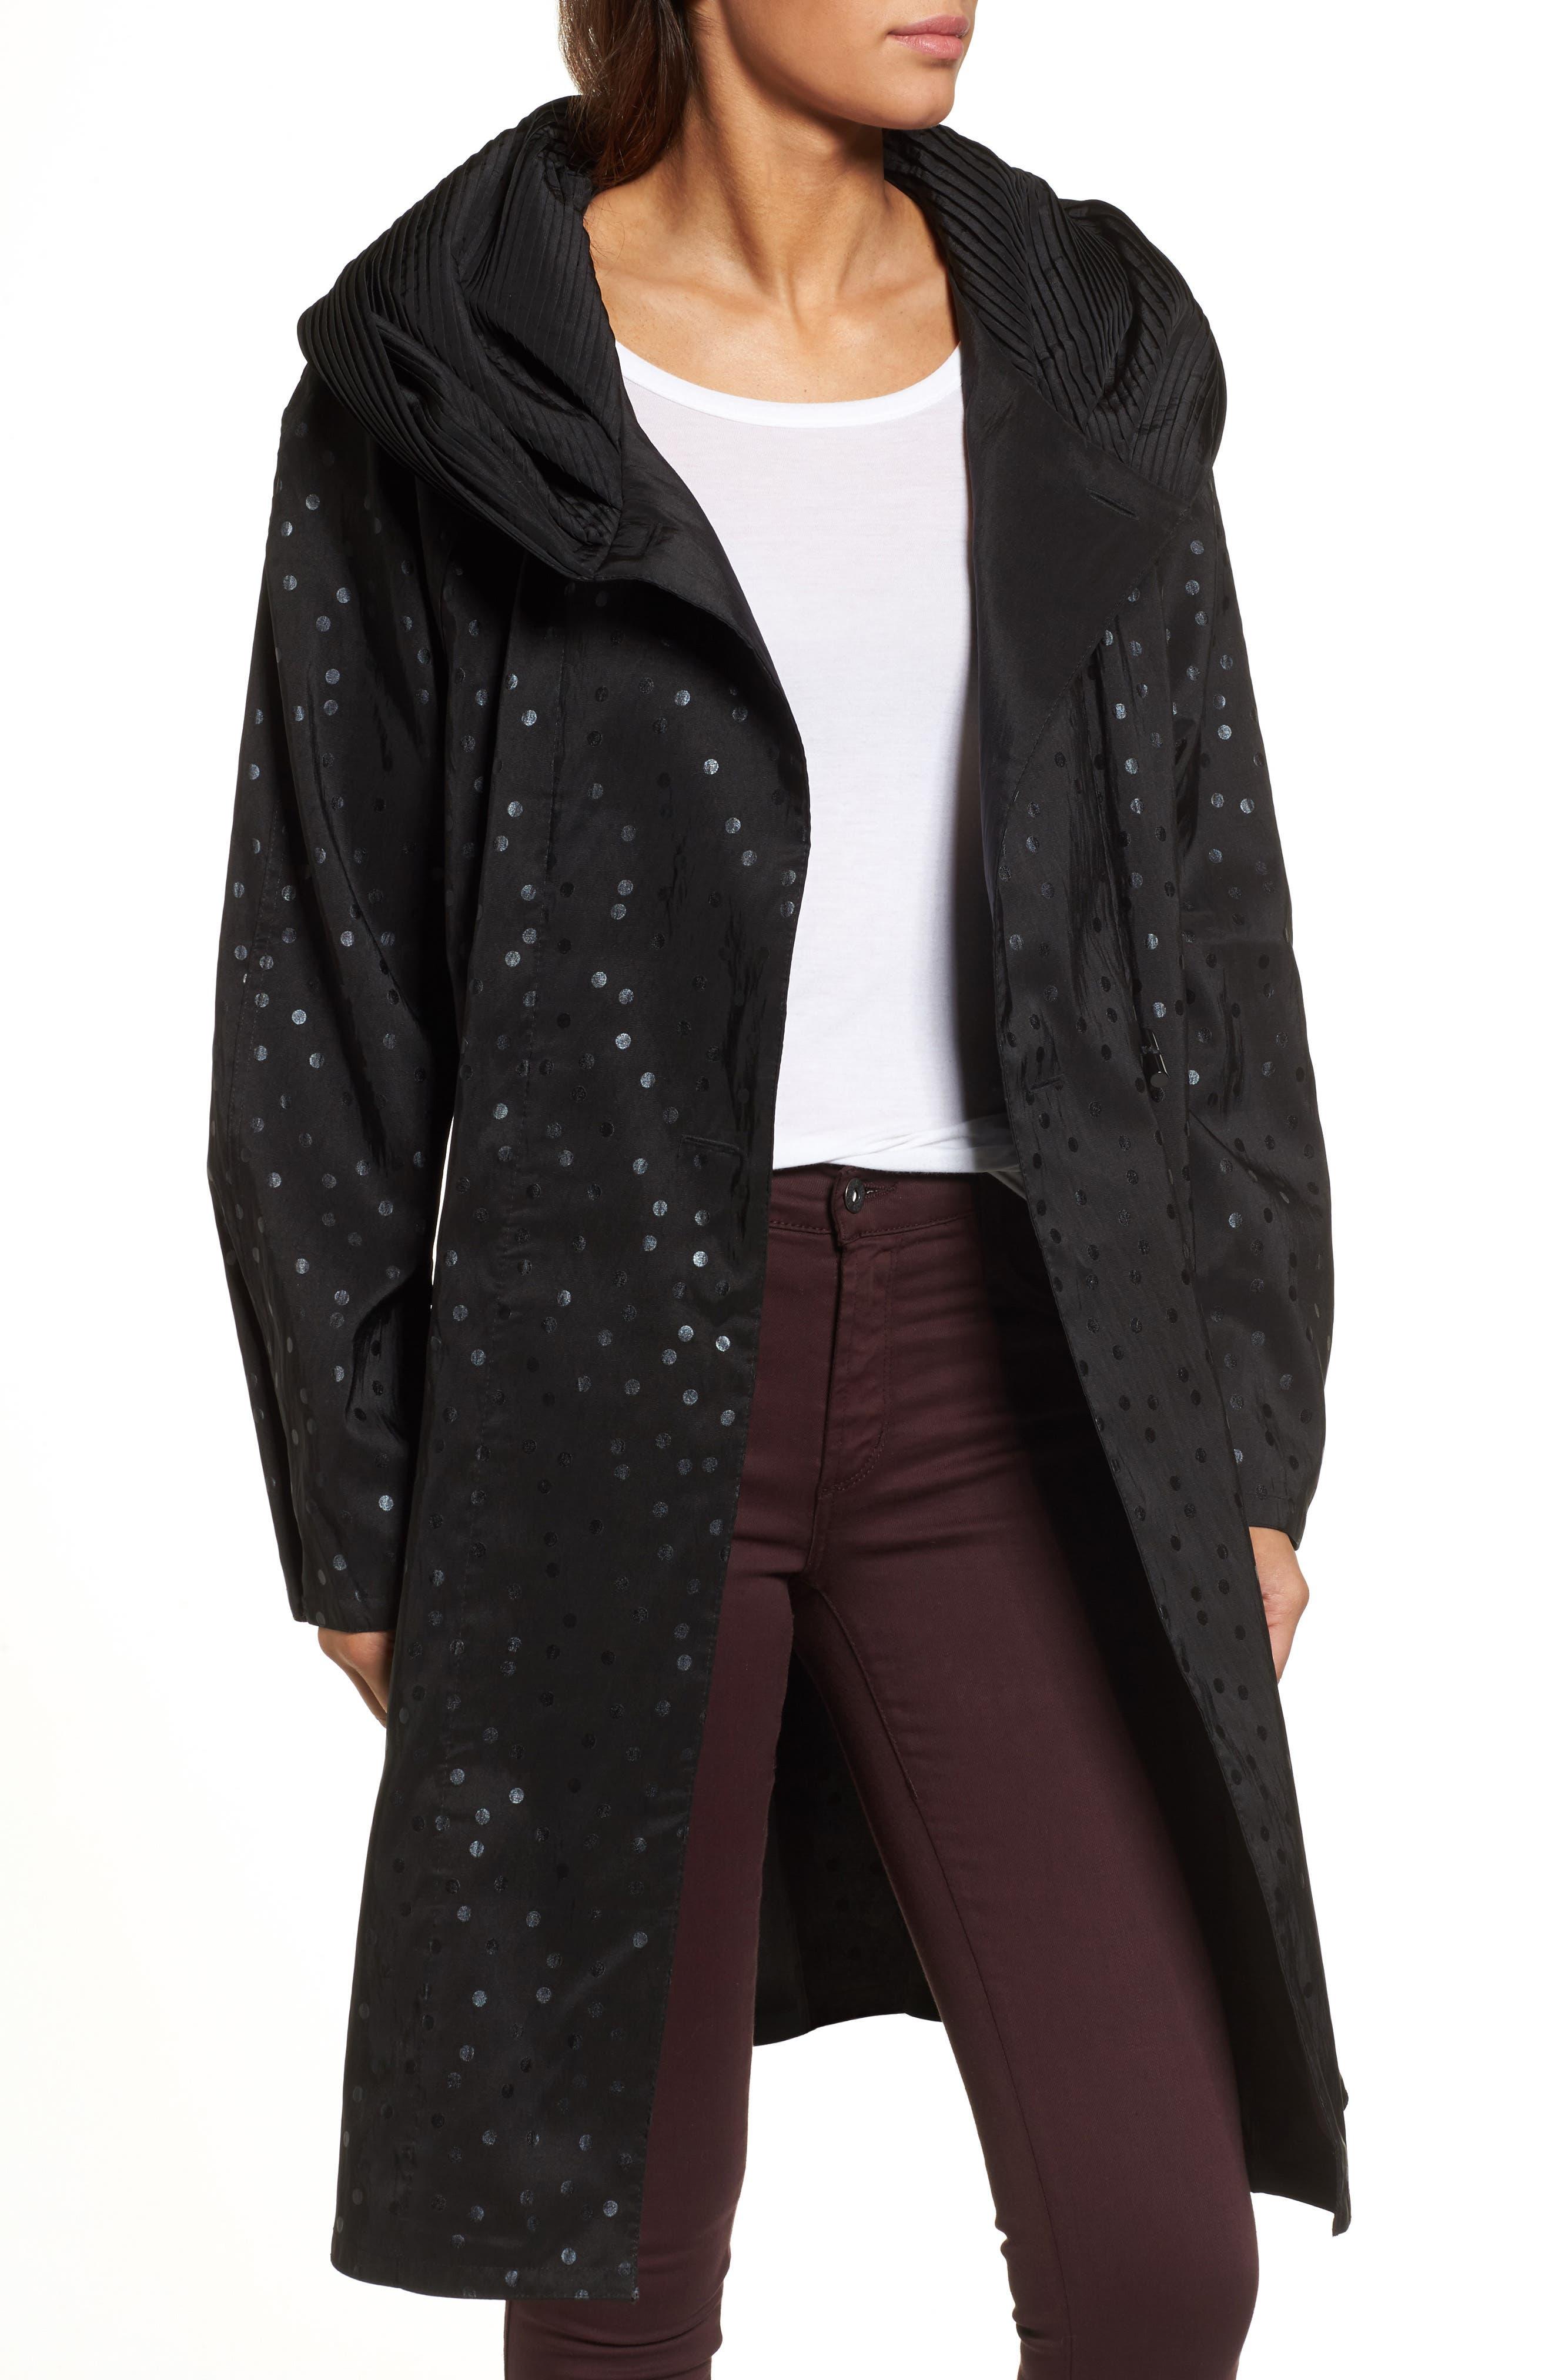 'Donatella' Reversible Dot Pleat Hood Packable Travel Coat,                         Main,                         color, 017